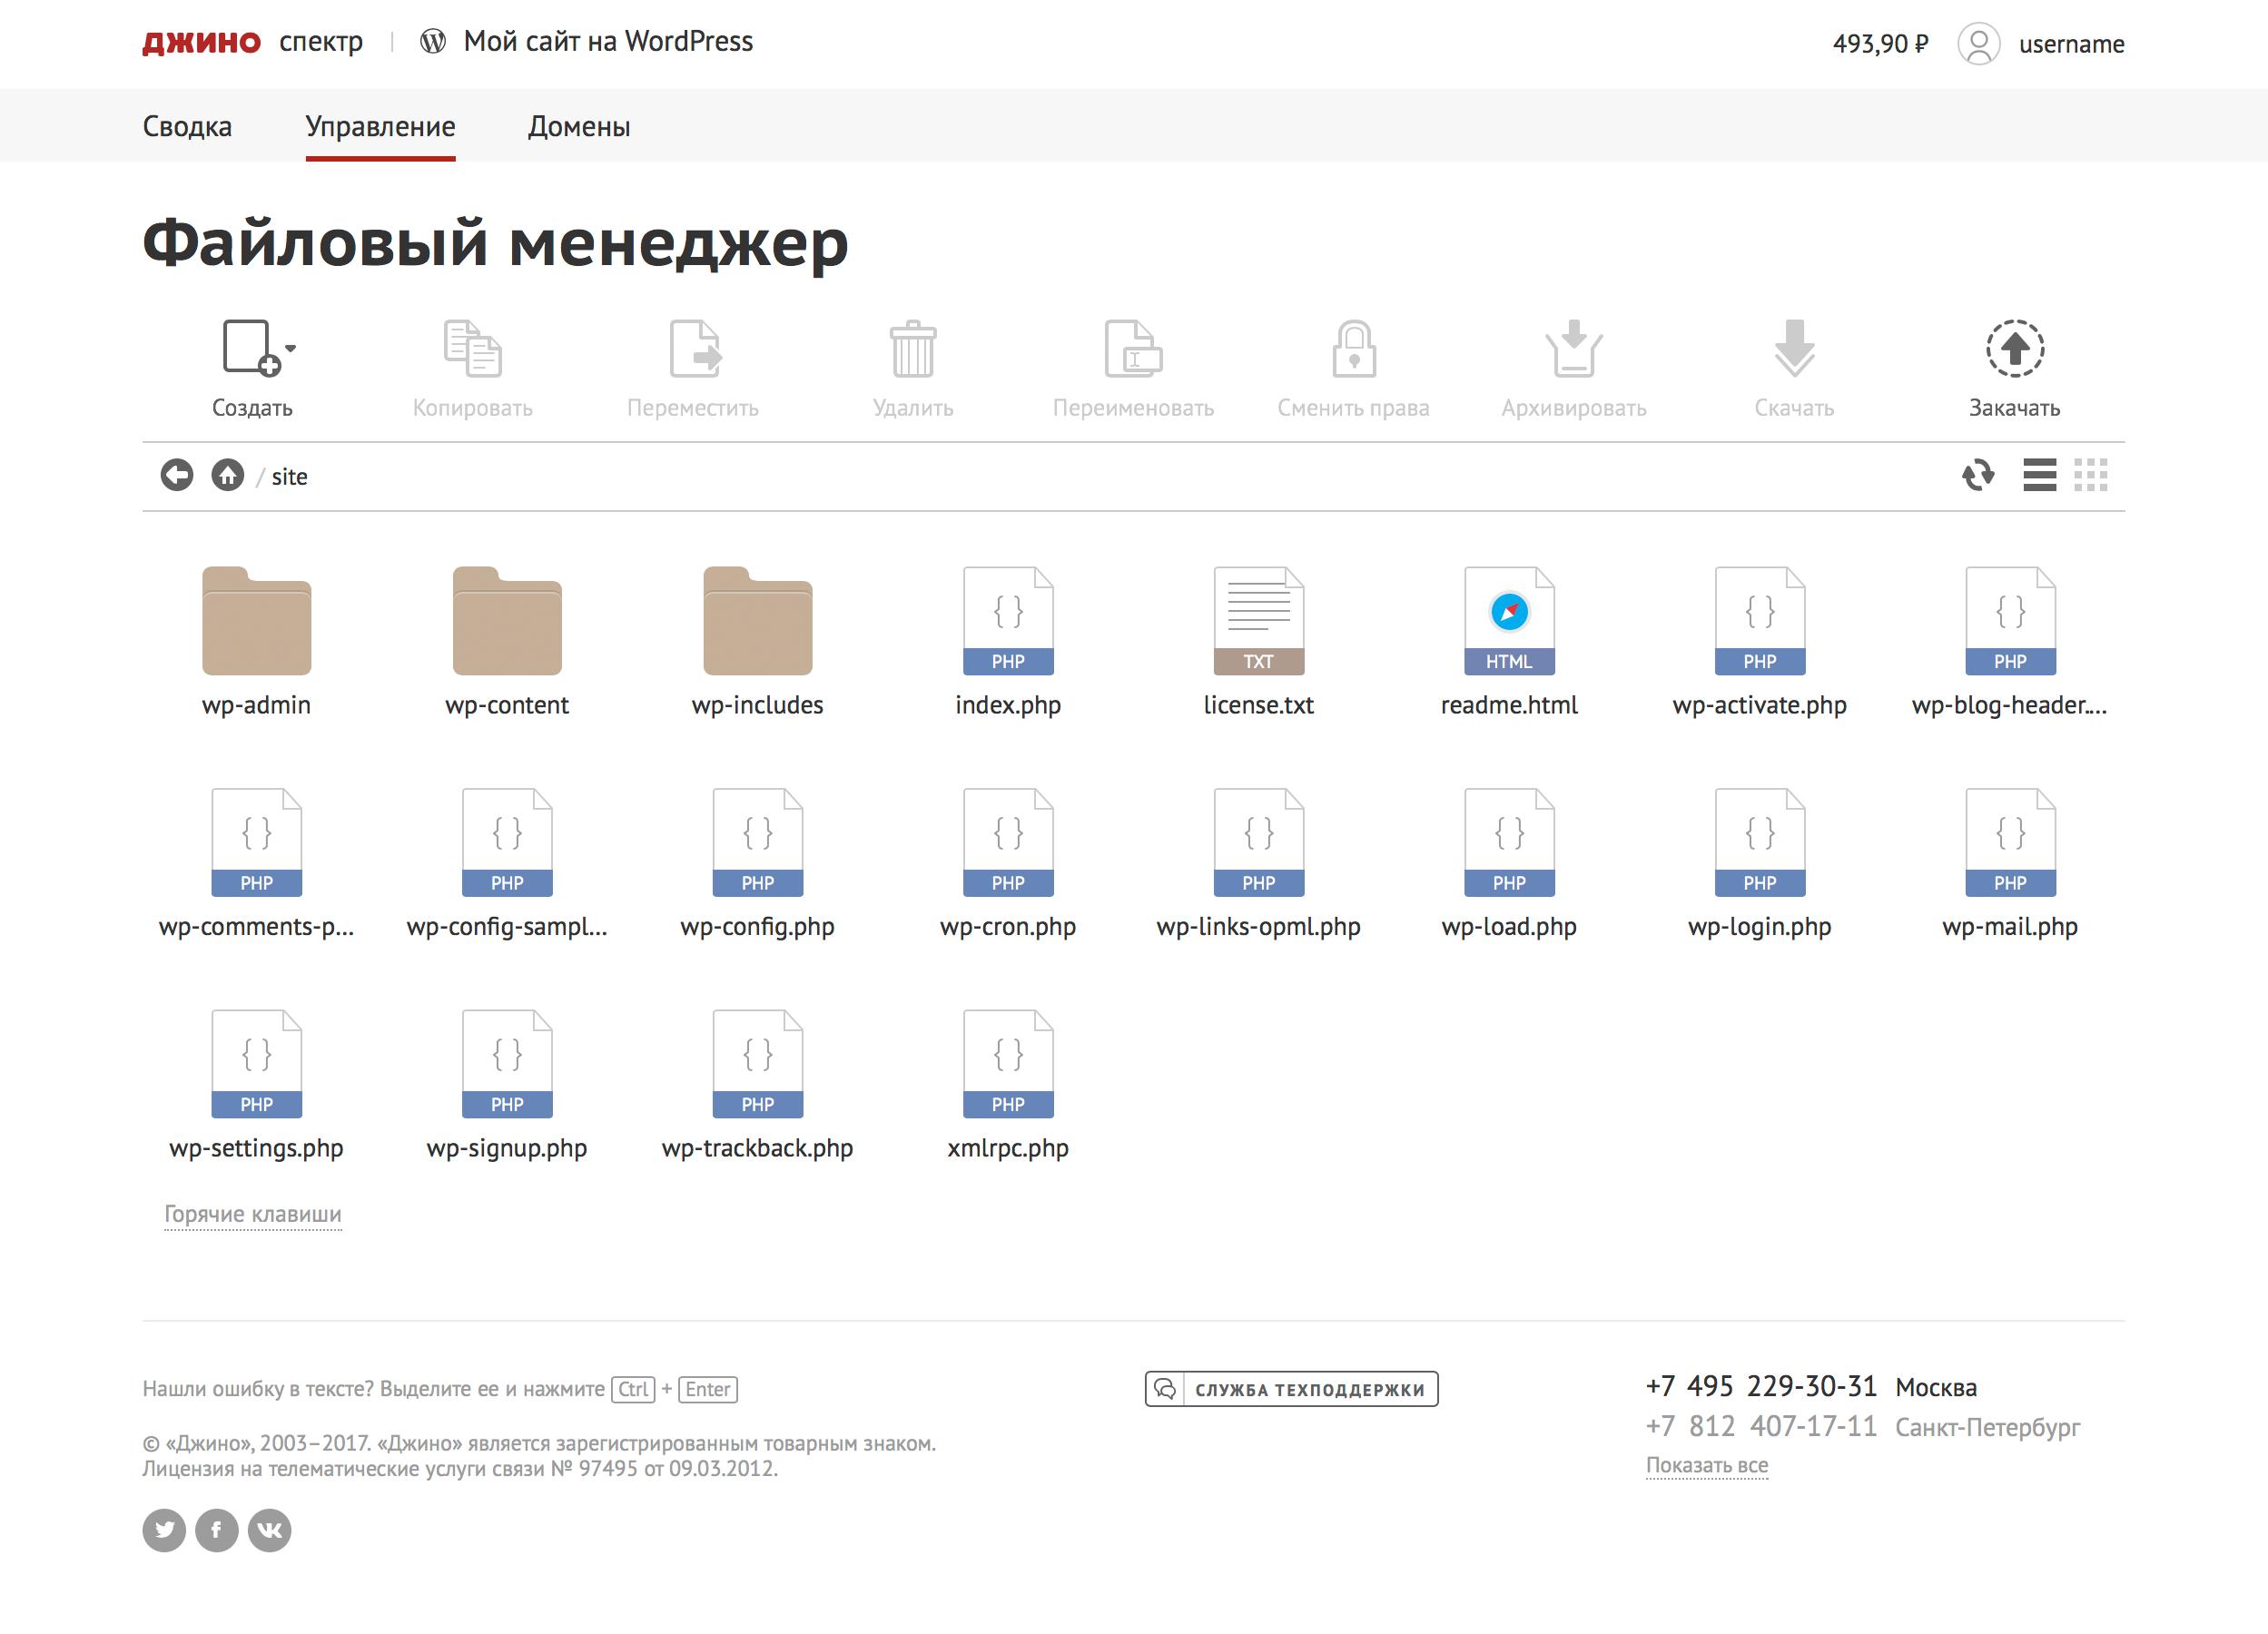 Установка wordpress на хостинг джино перенос сайта на хостинг opencart